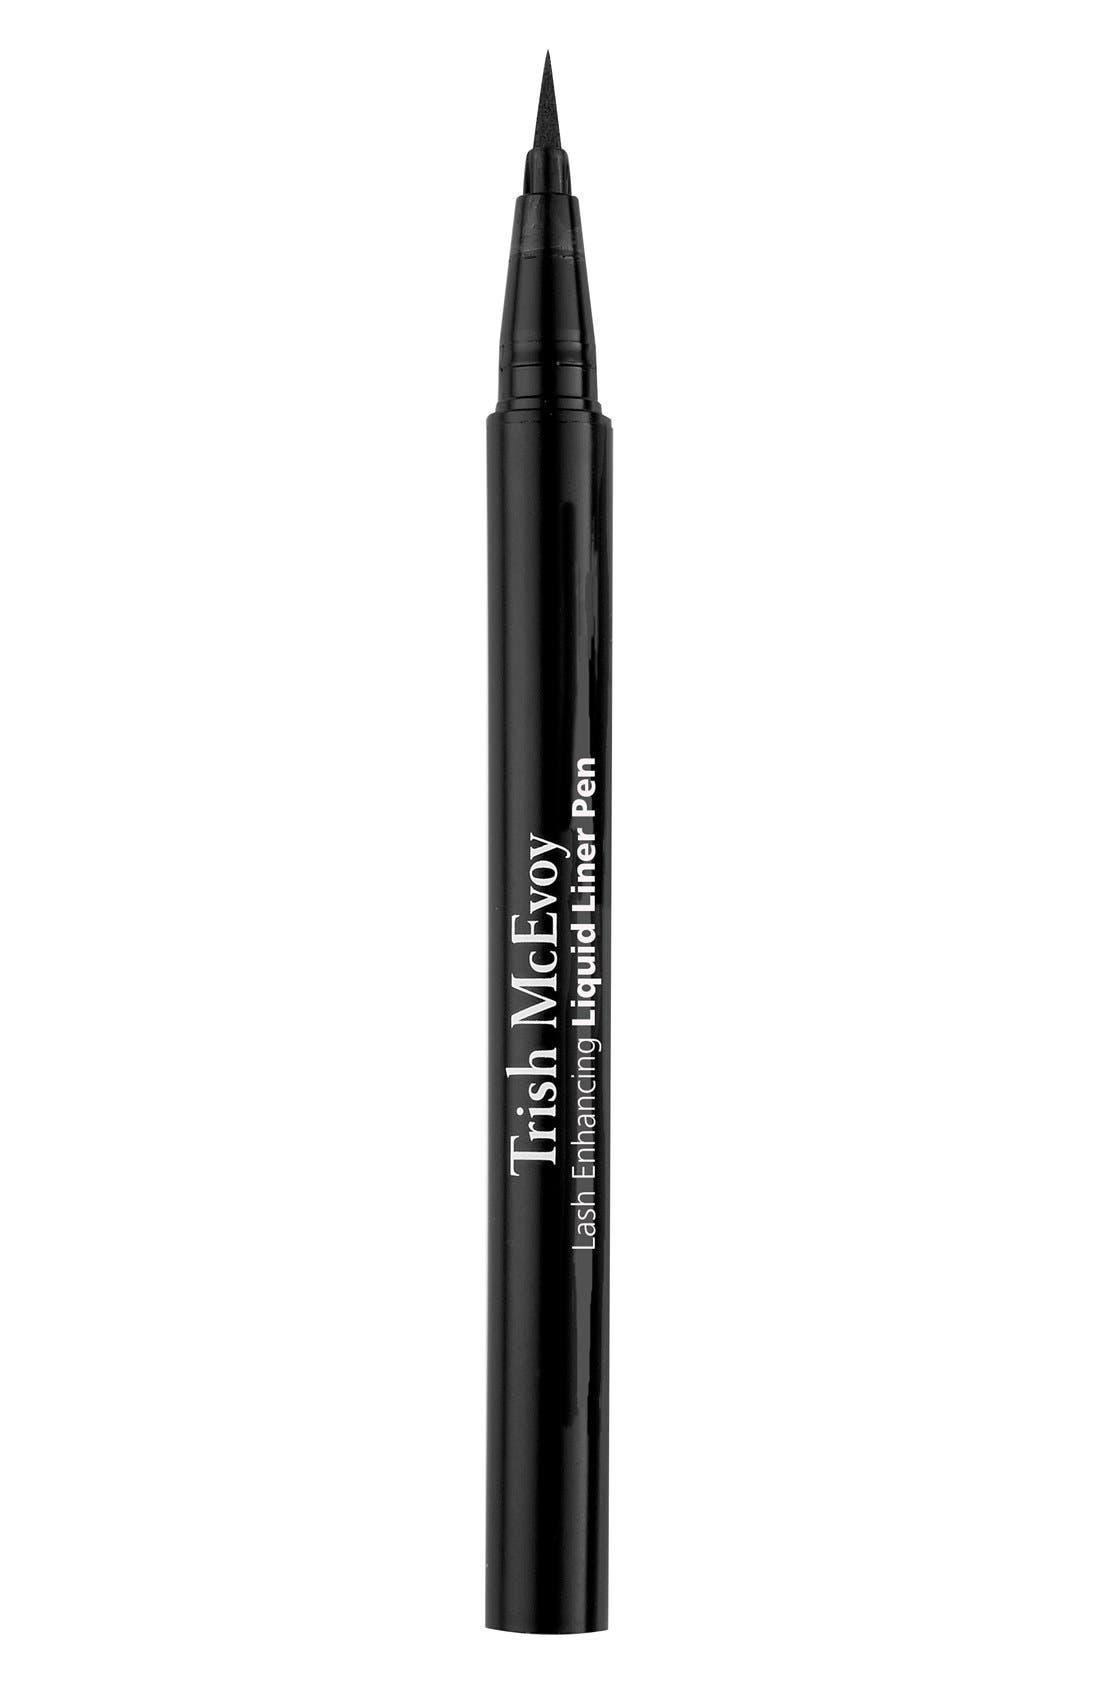 Trish McEvoy Lash Enhancing Liquid Liner Pen